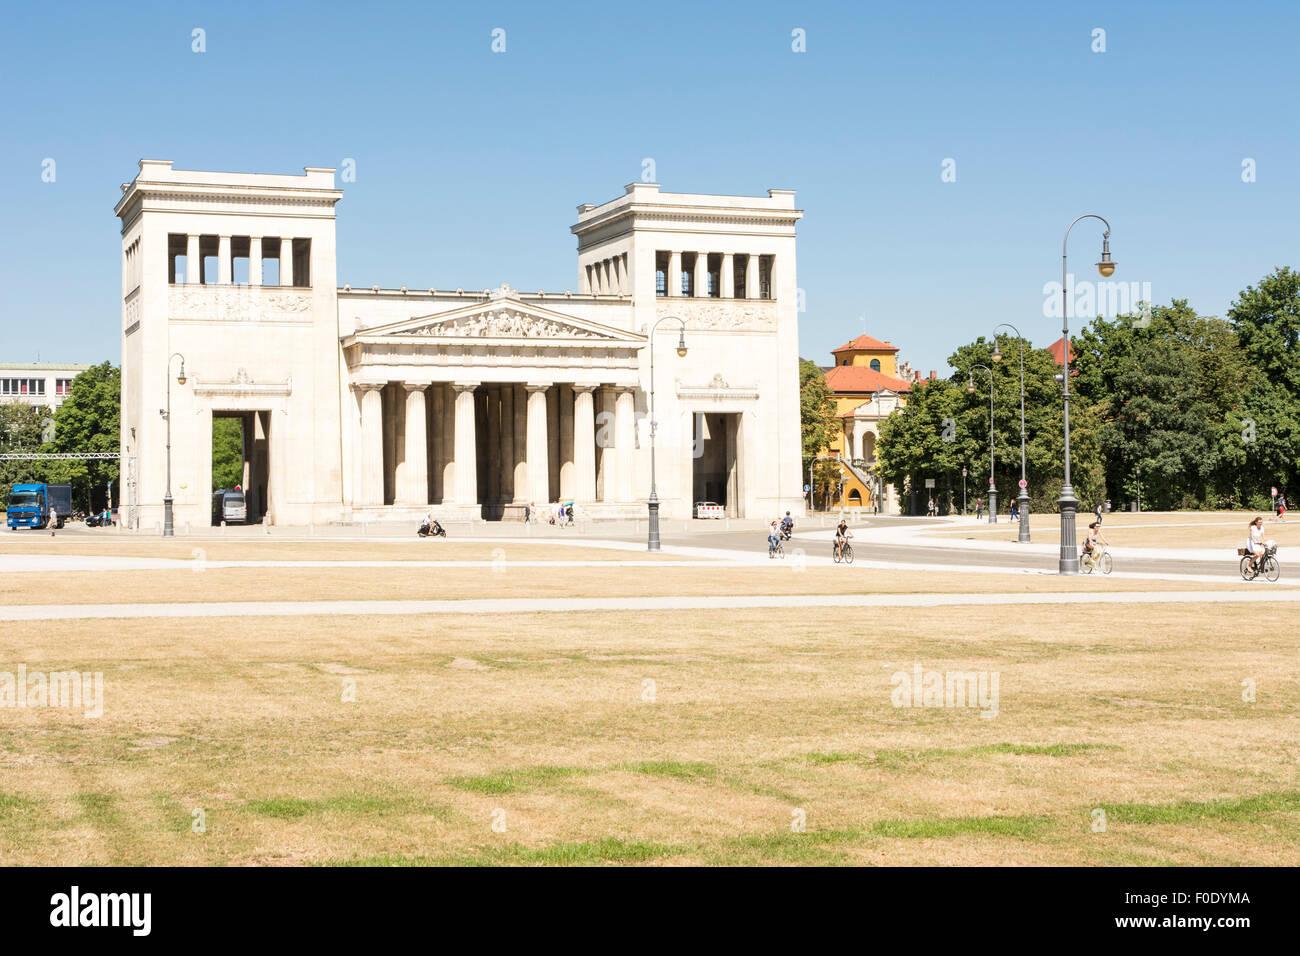 MUNICH, GERMANY - AUGUST 3: Tourits at the Koenigsplatz in Munich, Germany on August 3, 2015. - Stock Image